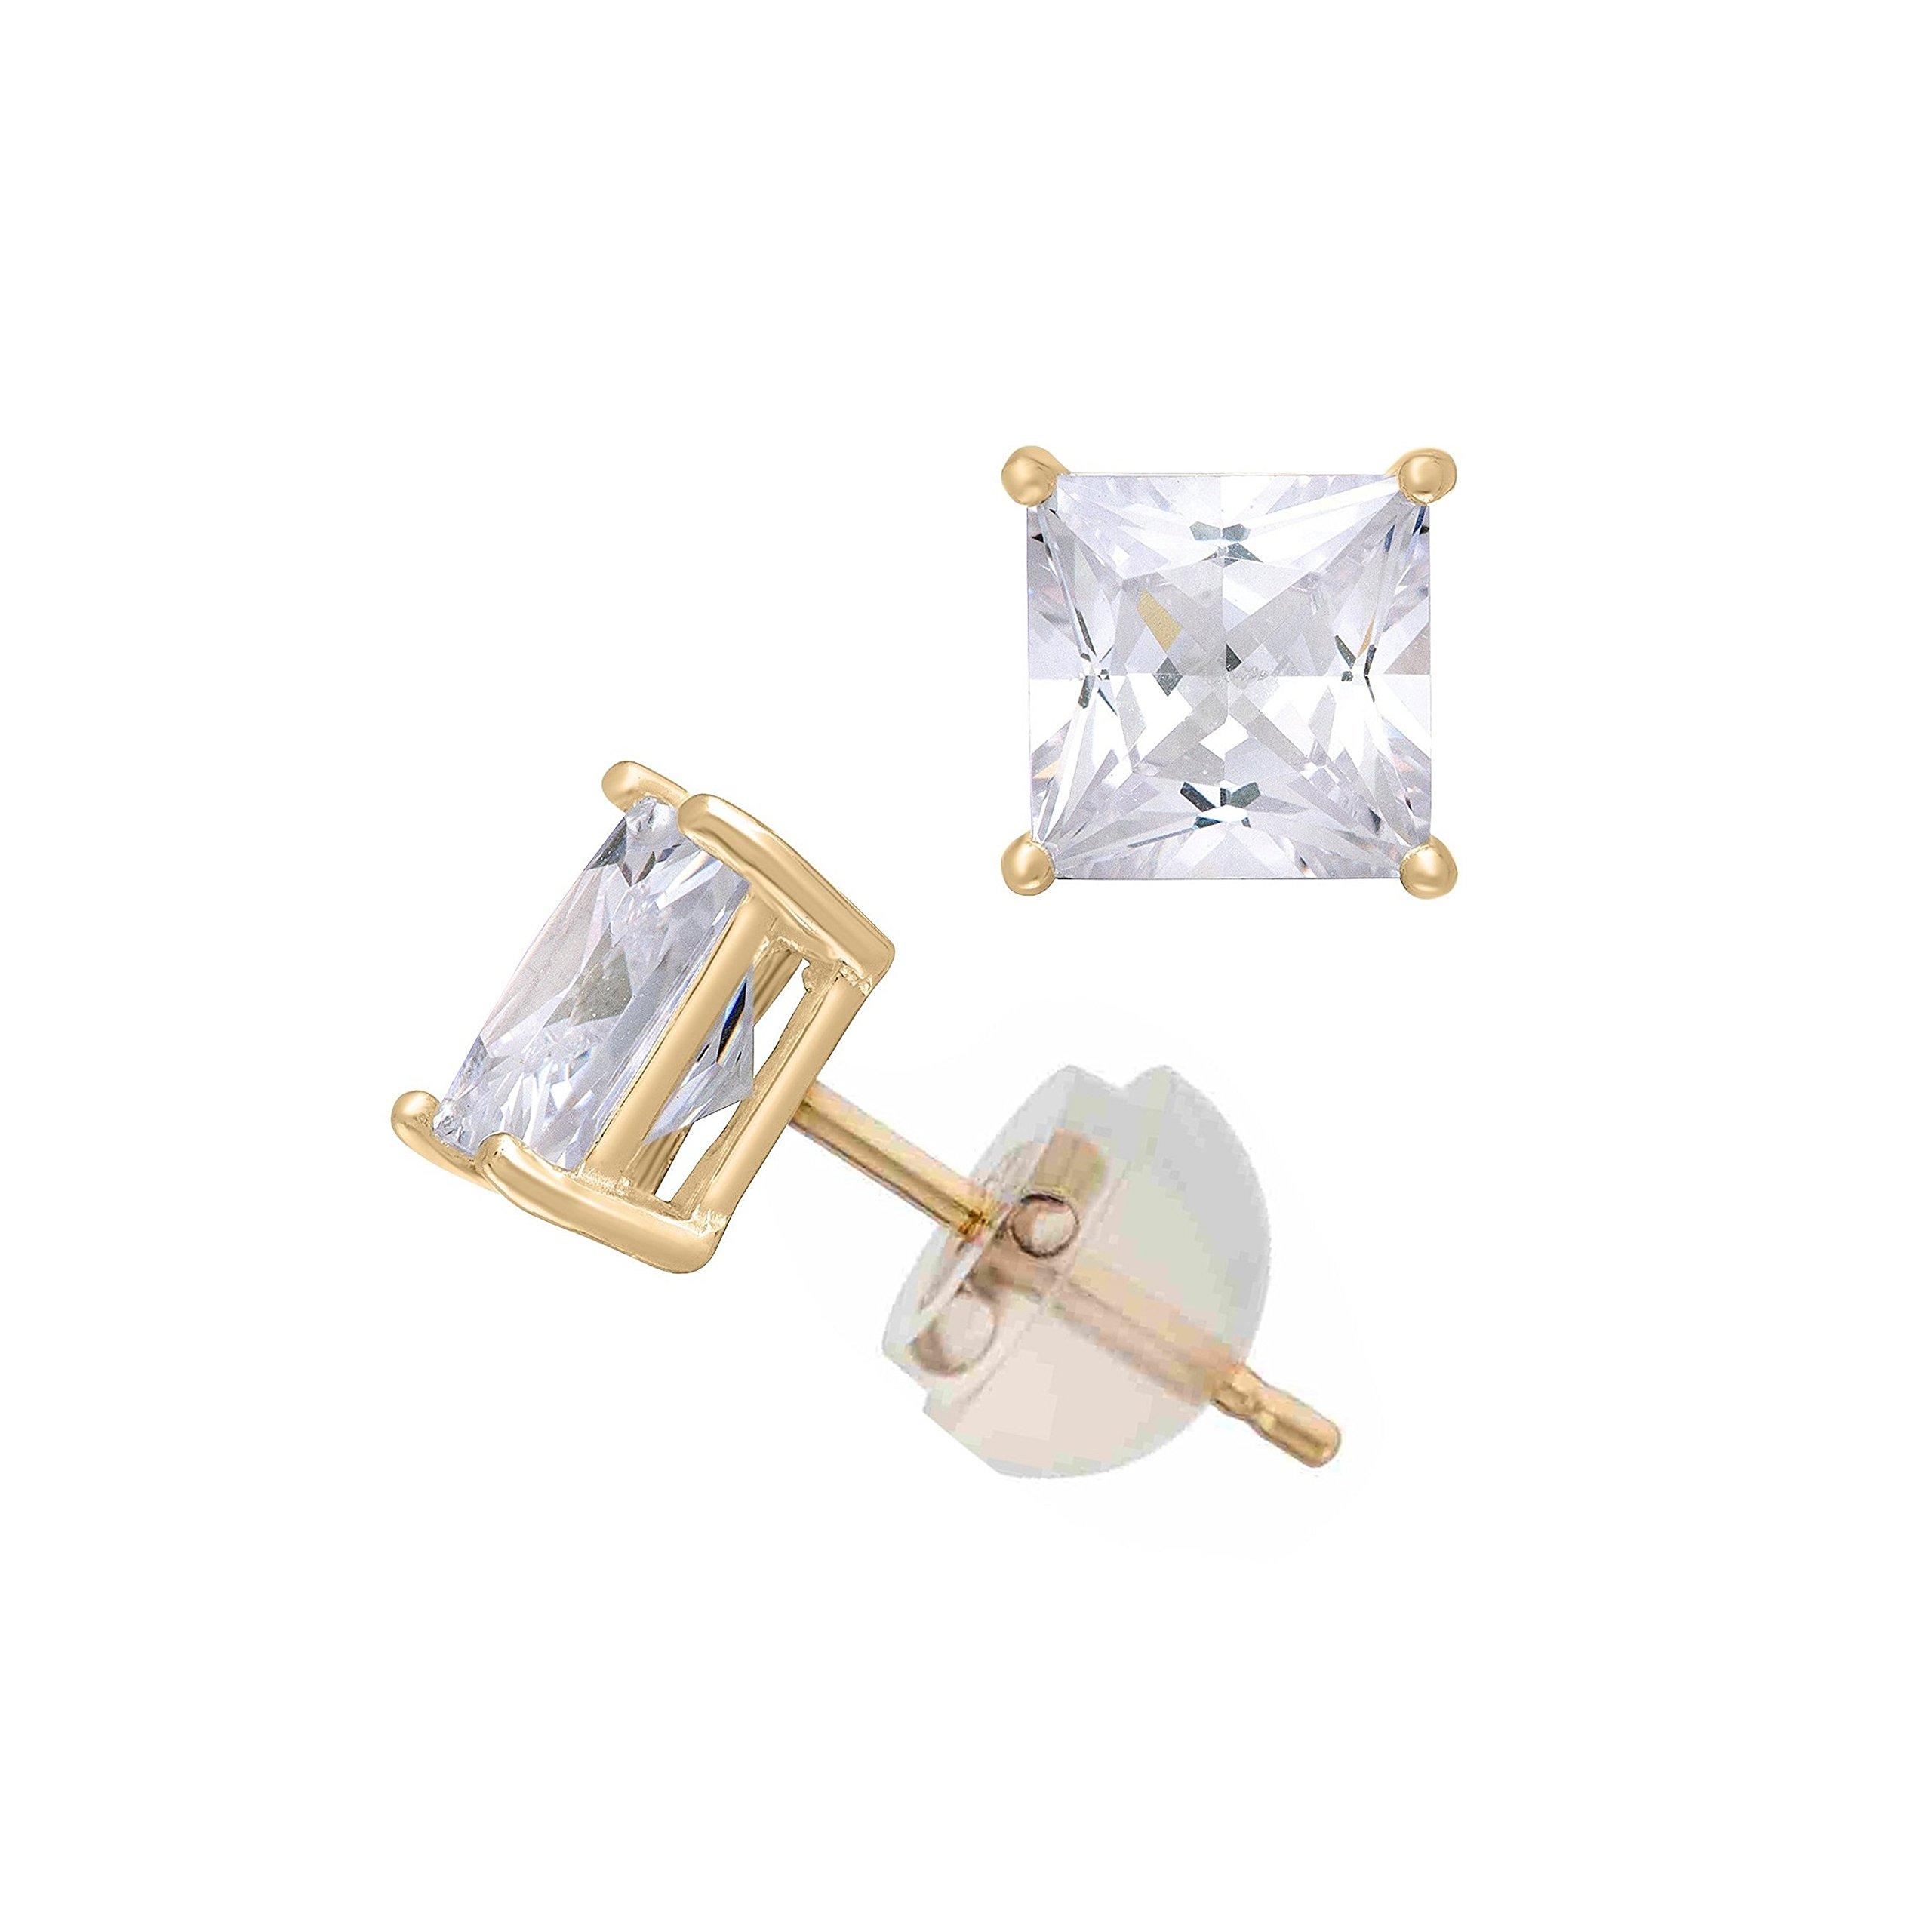 14K Yellow Gold Cubic Zirconia Princess Cut CZ 2.0 mm Stud Earring Comfort Fit